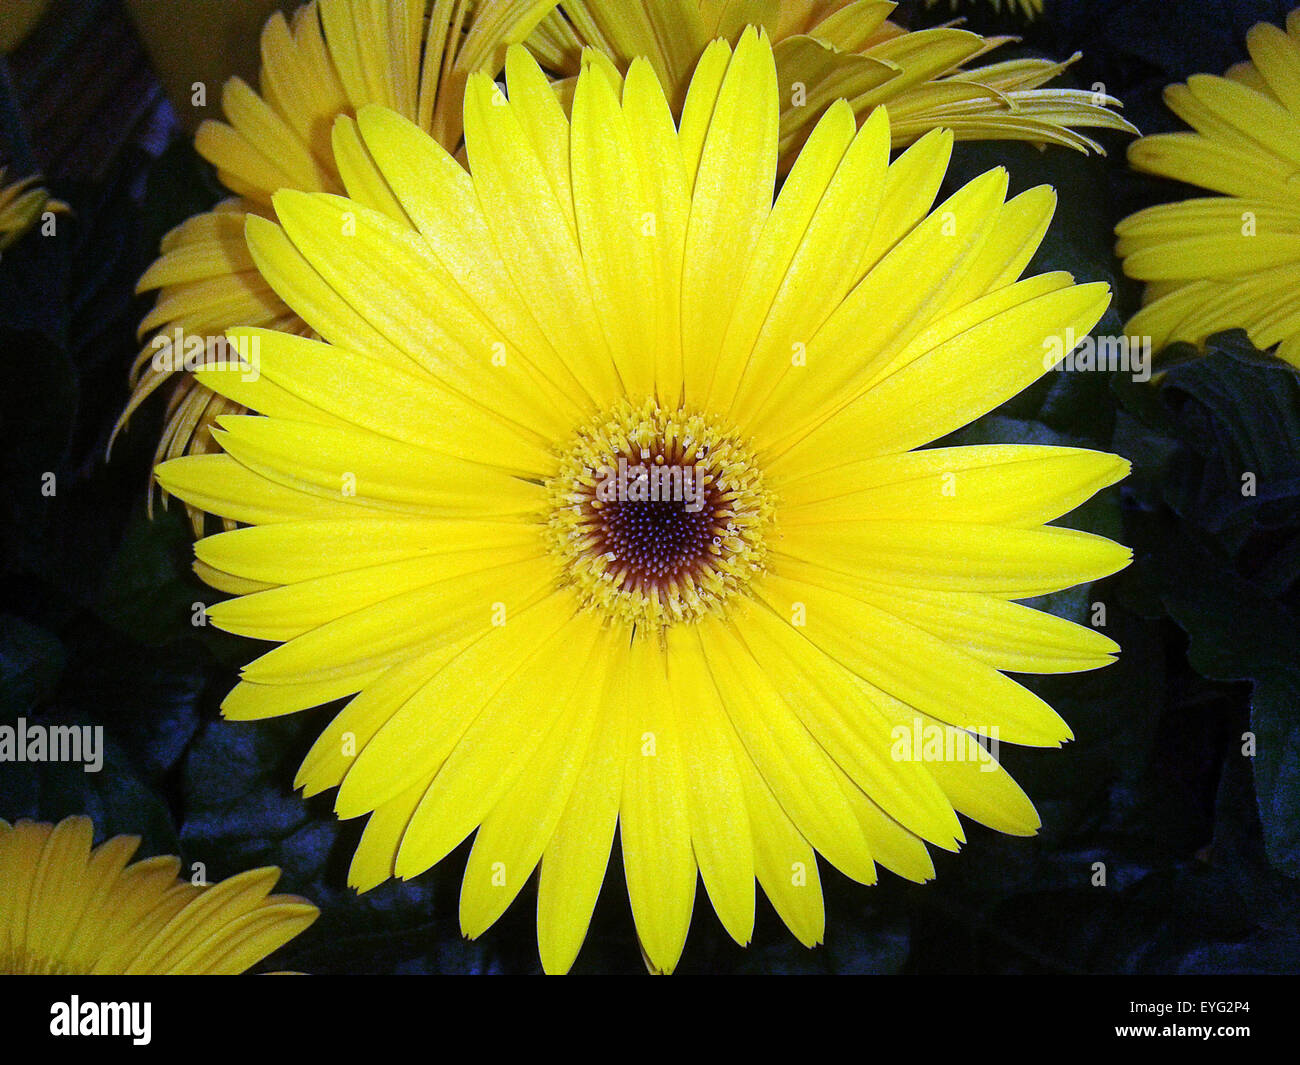 Gerbera, Afrika, Madagaskar, Sommerblume, Stock Photo